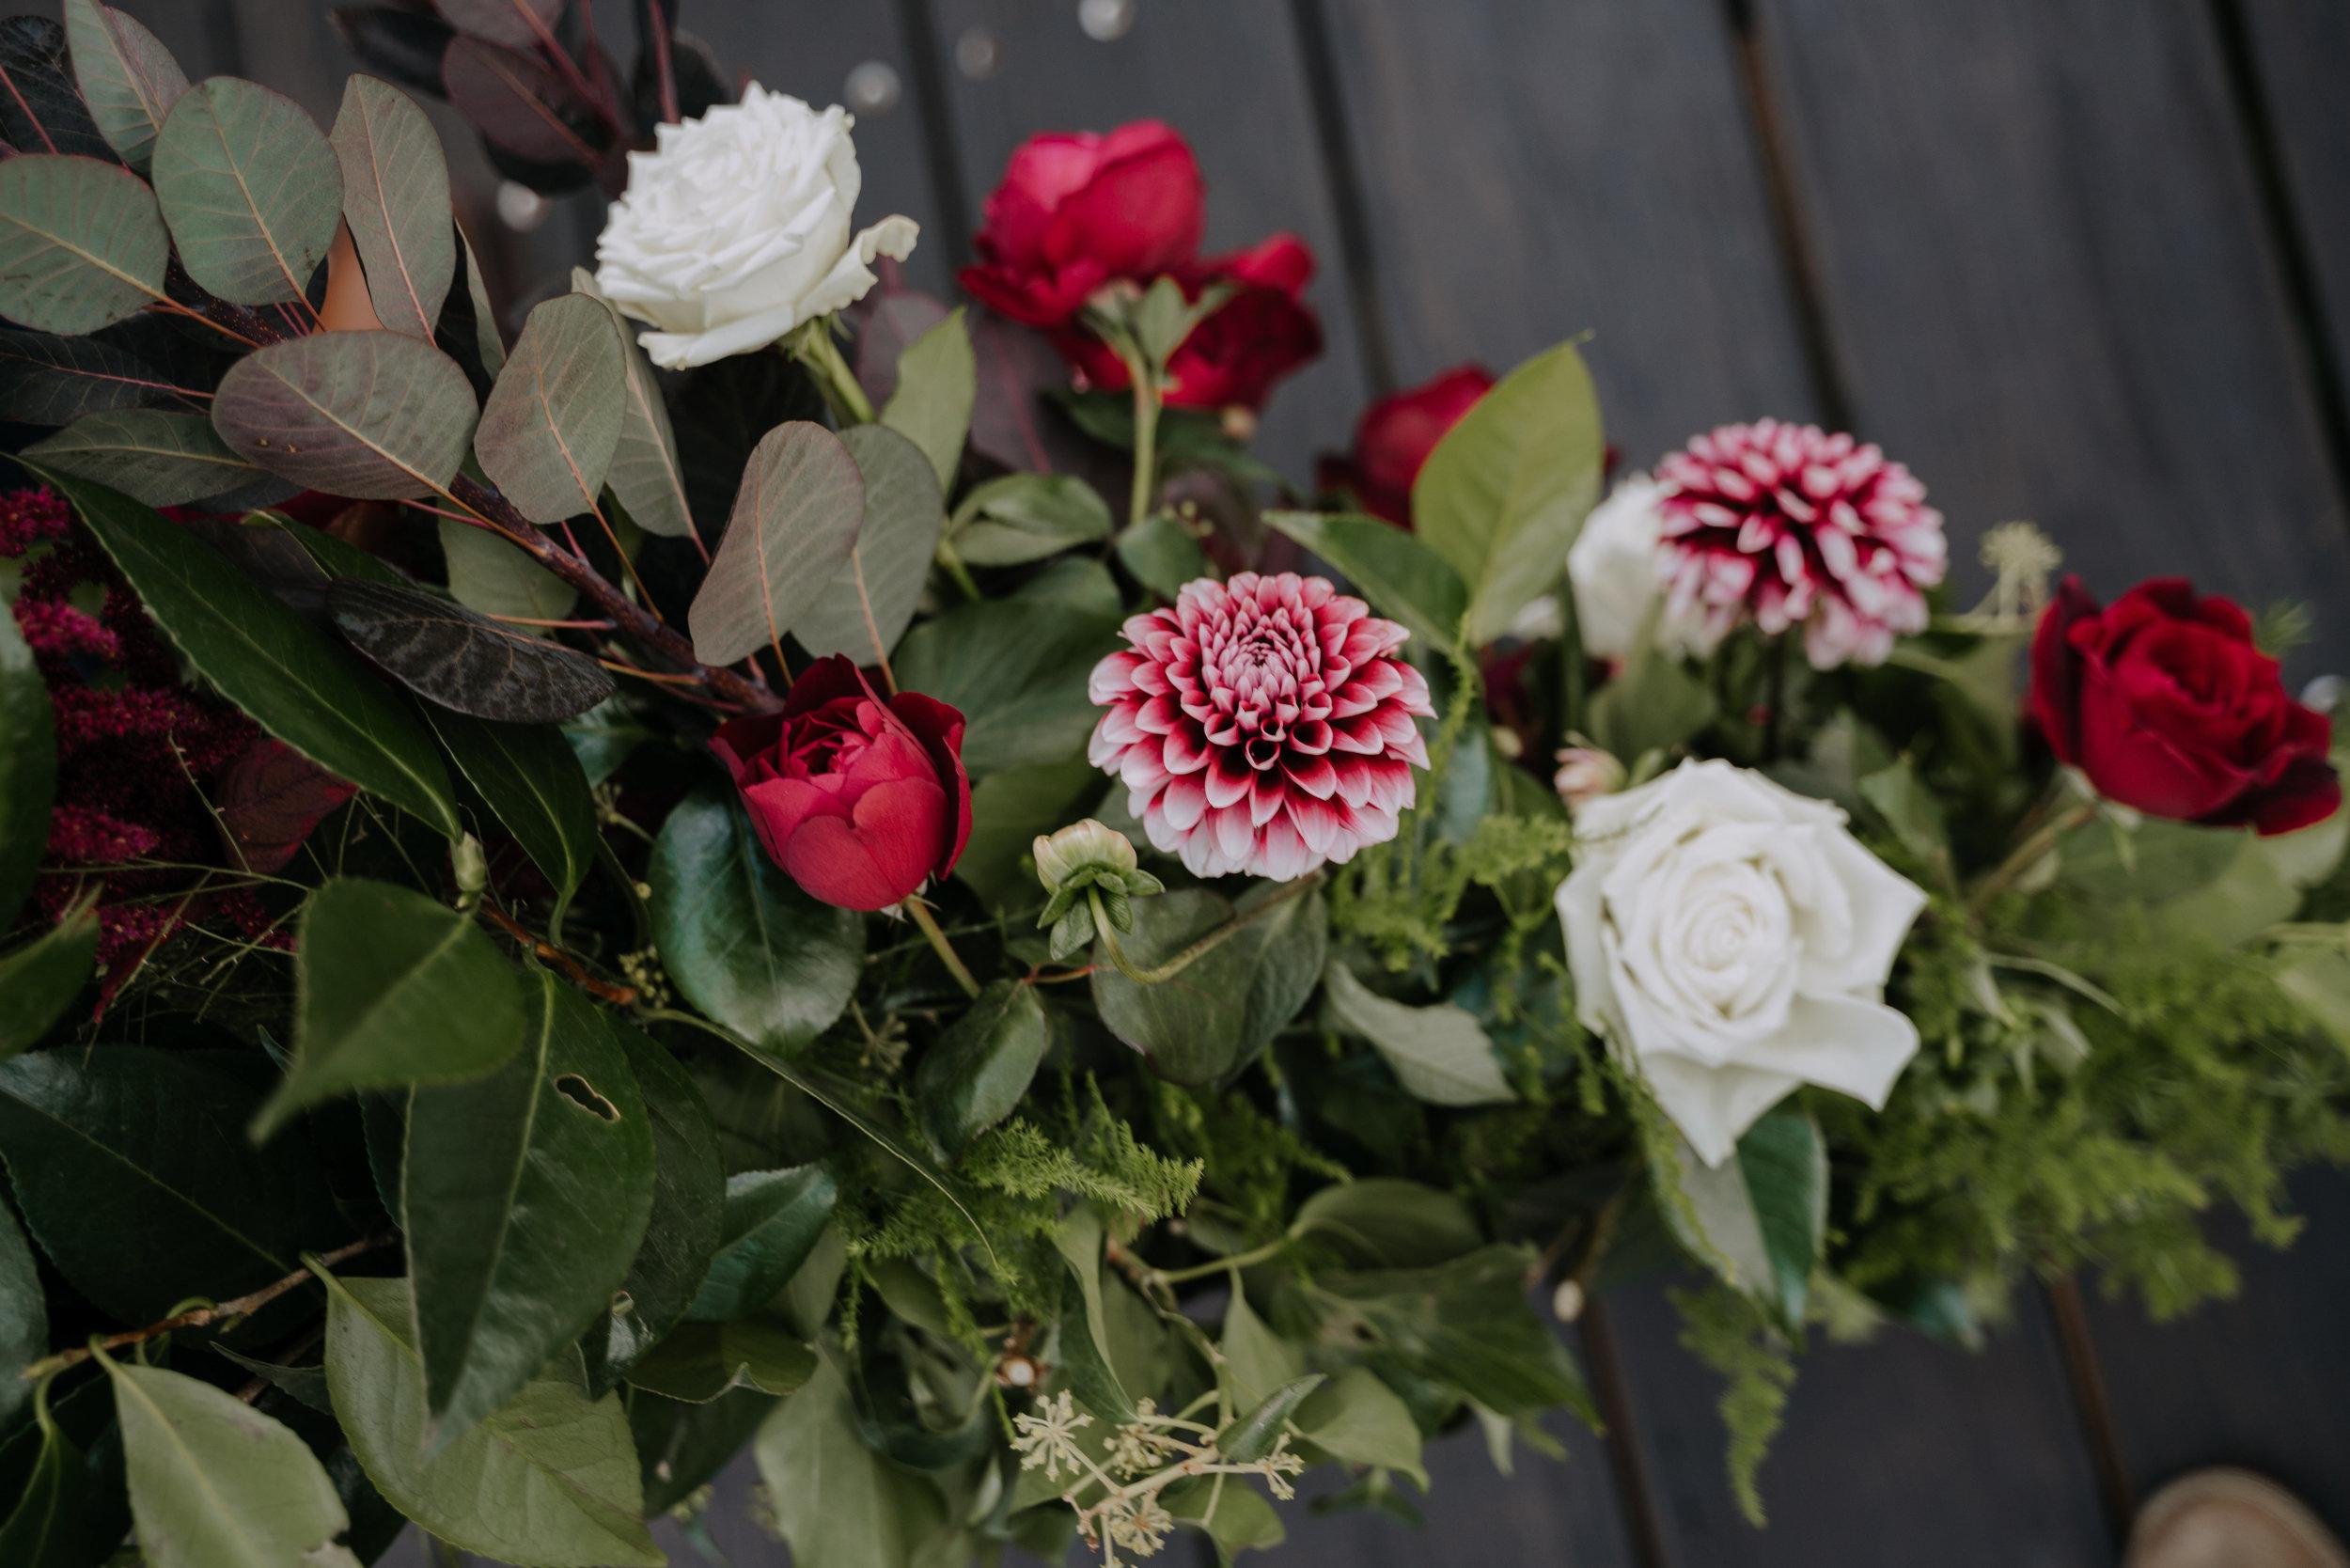 Loni-and-Damien-Projekt-3488-Wedding-0299.jpg